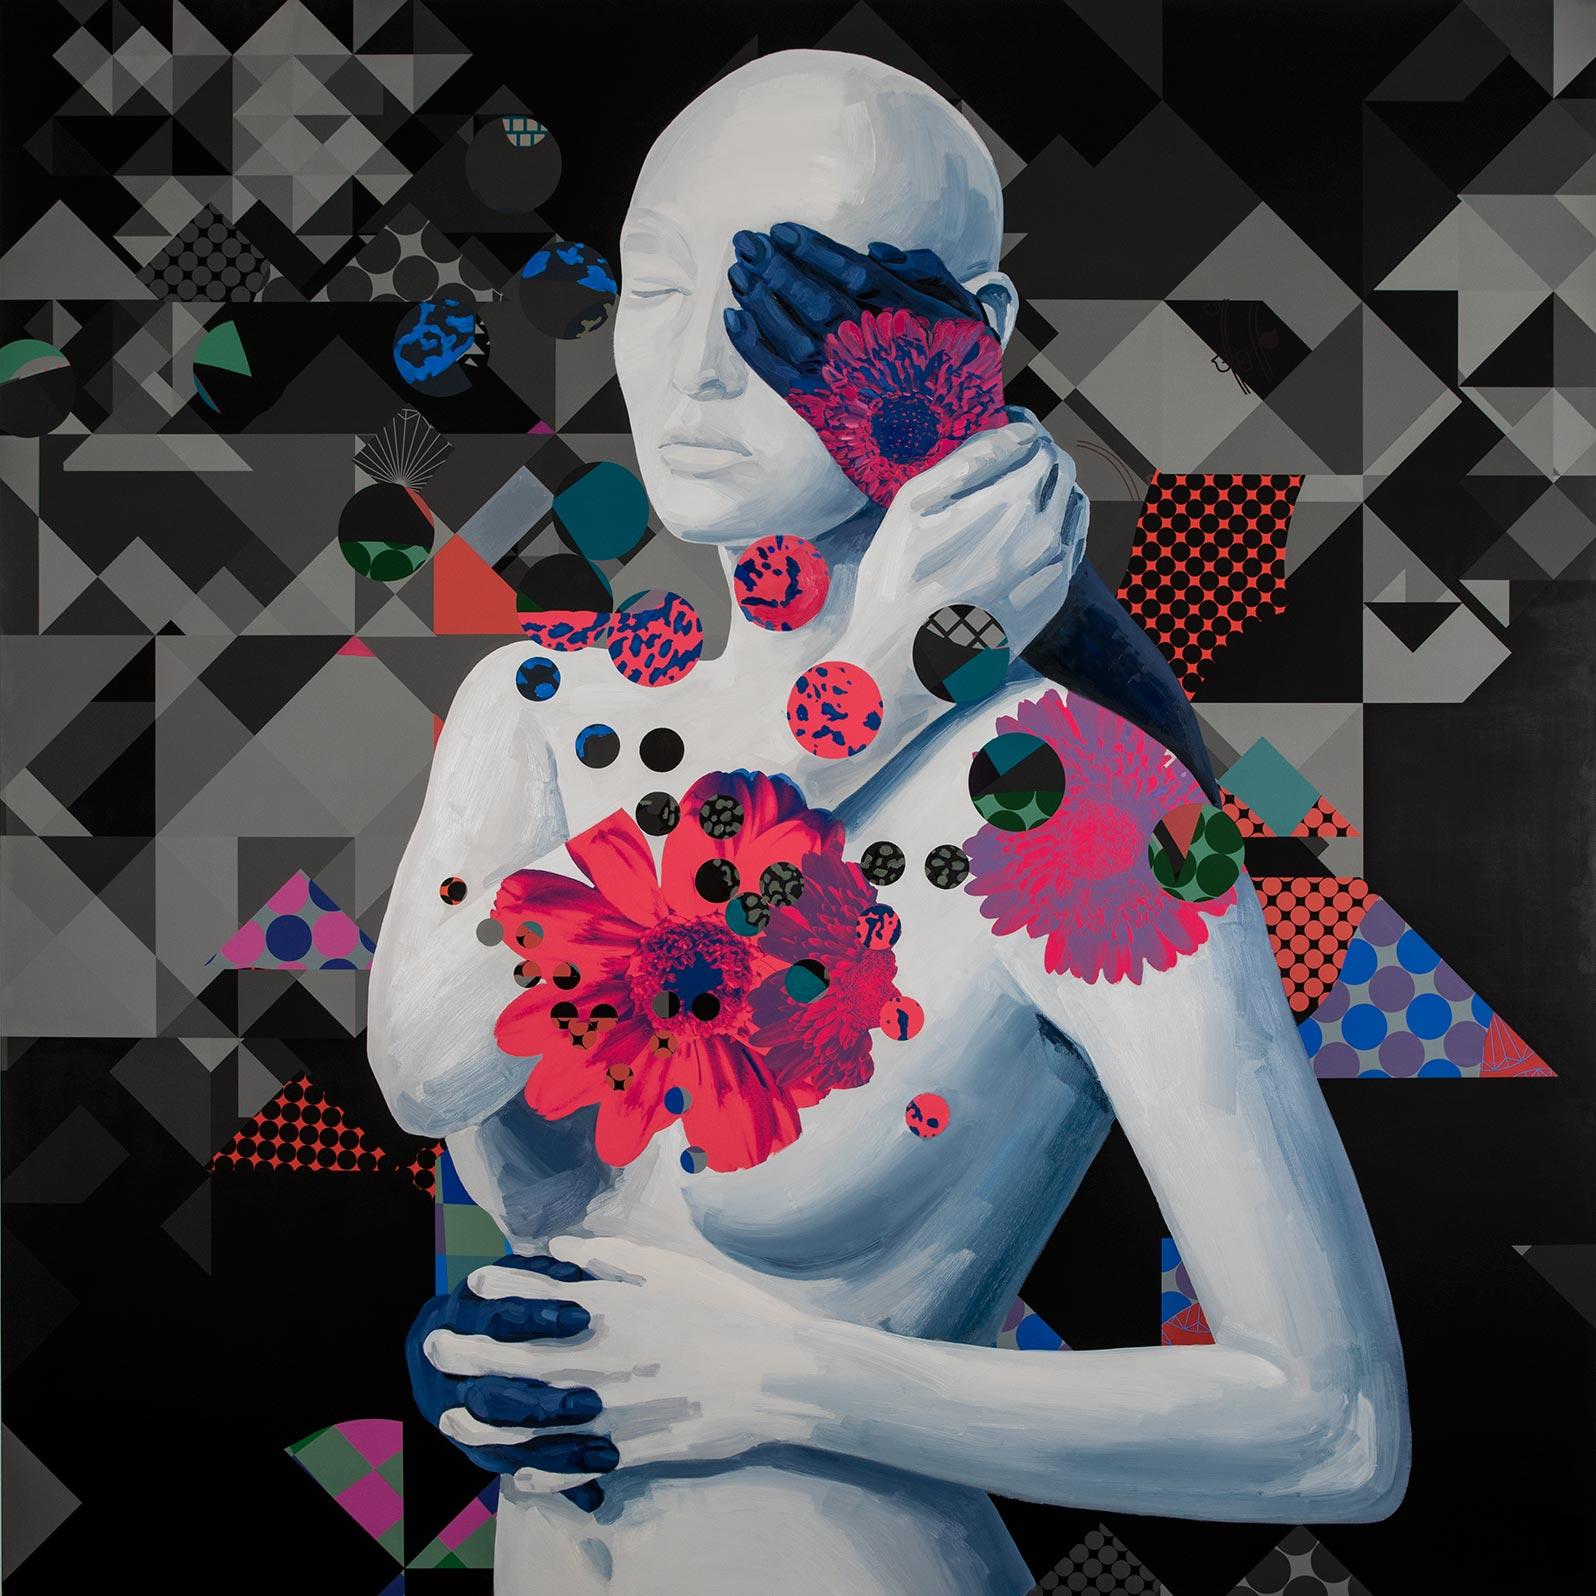 Anca Stefanescu | Mixed Media | AnotherPortionOfSelf, Modern Art Paintings